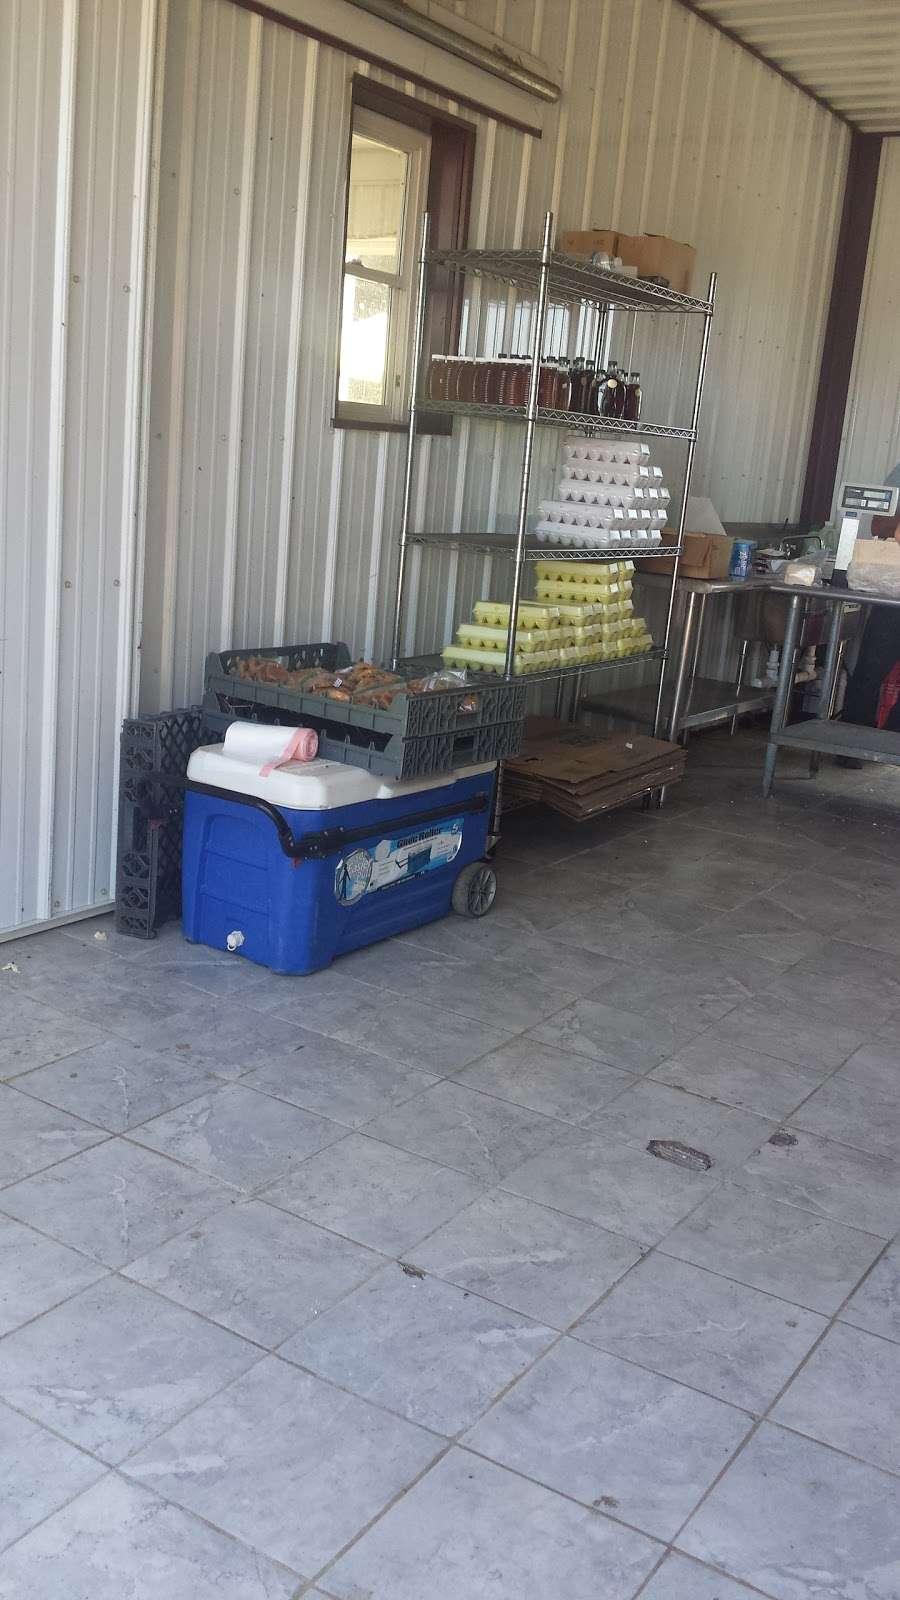 Amish meat John Wye - store  | Photo 7 of 10 | Address: 37404 Westham Ln, Mechanicsville, MD 20659, USA | Phone: (240) 707-1269